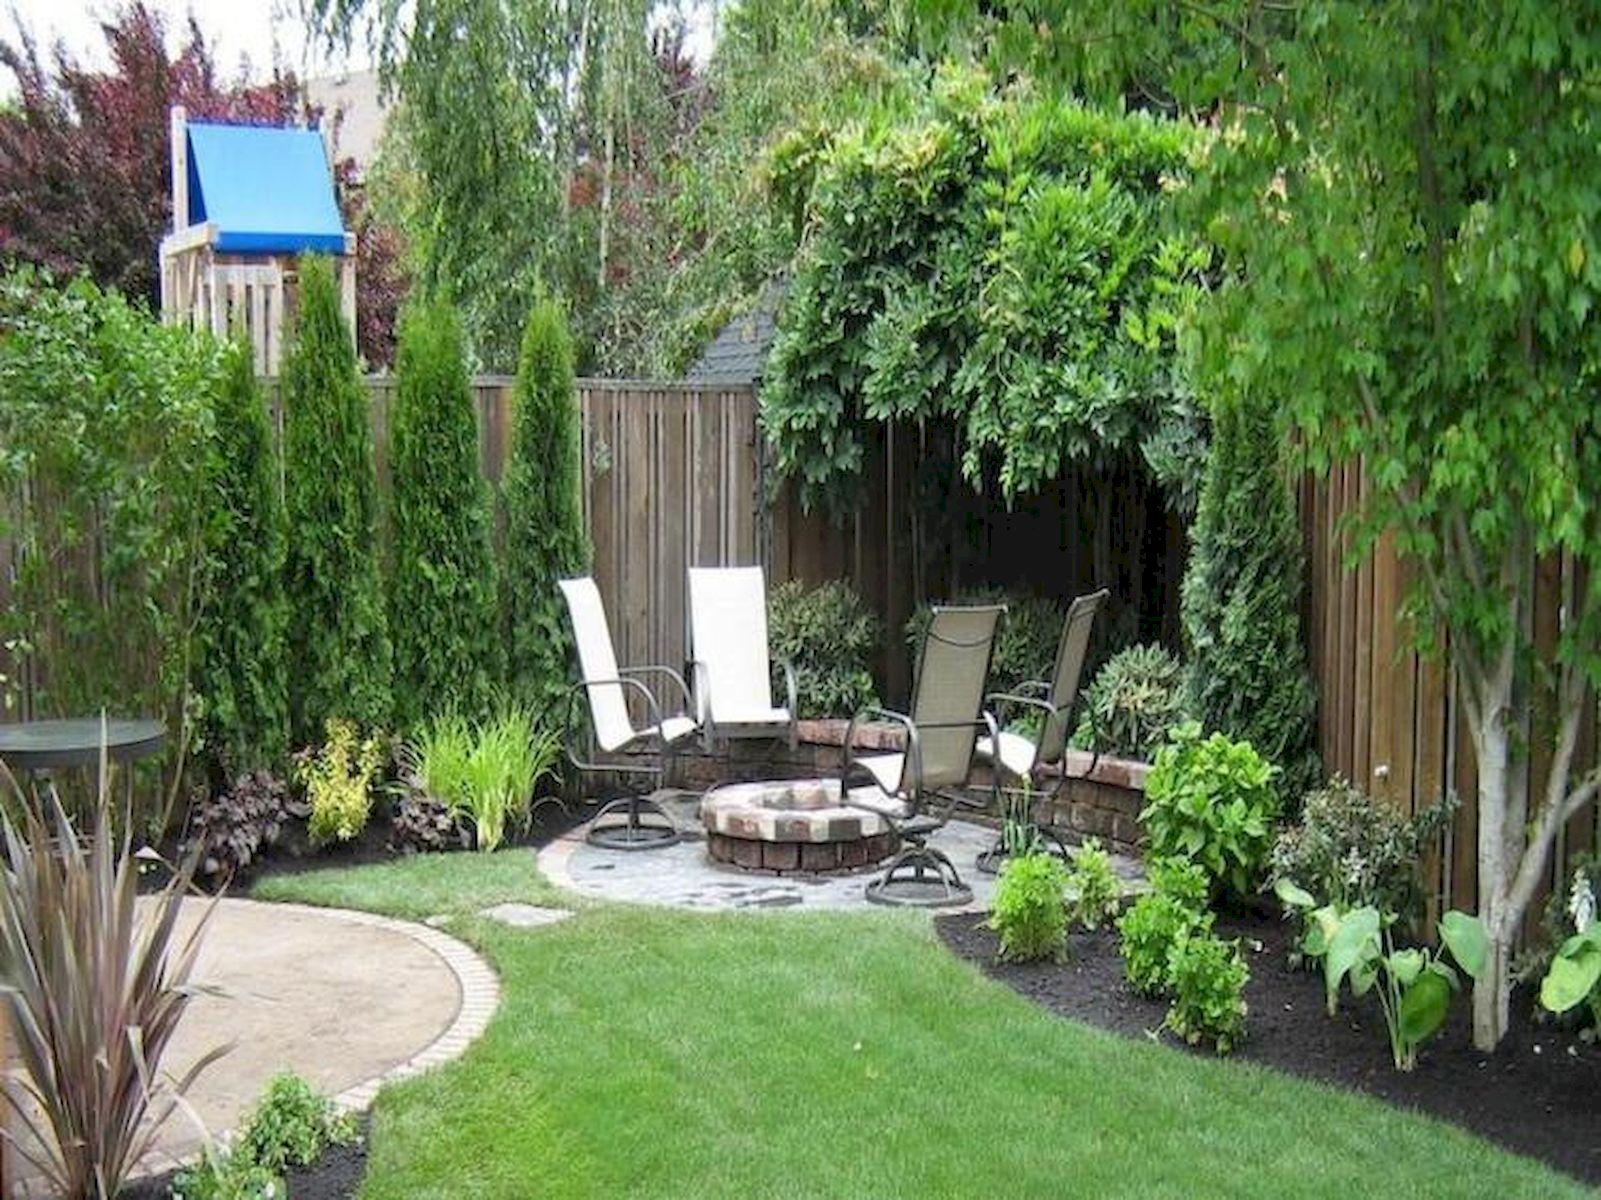 60 Awesome DIY Backyard Privacy Design And Decor Ideas (1)